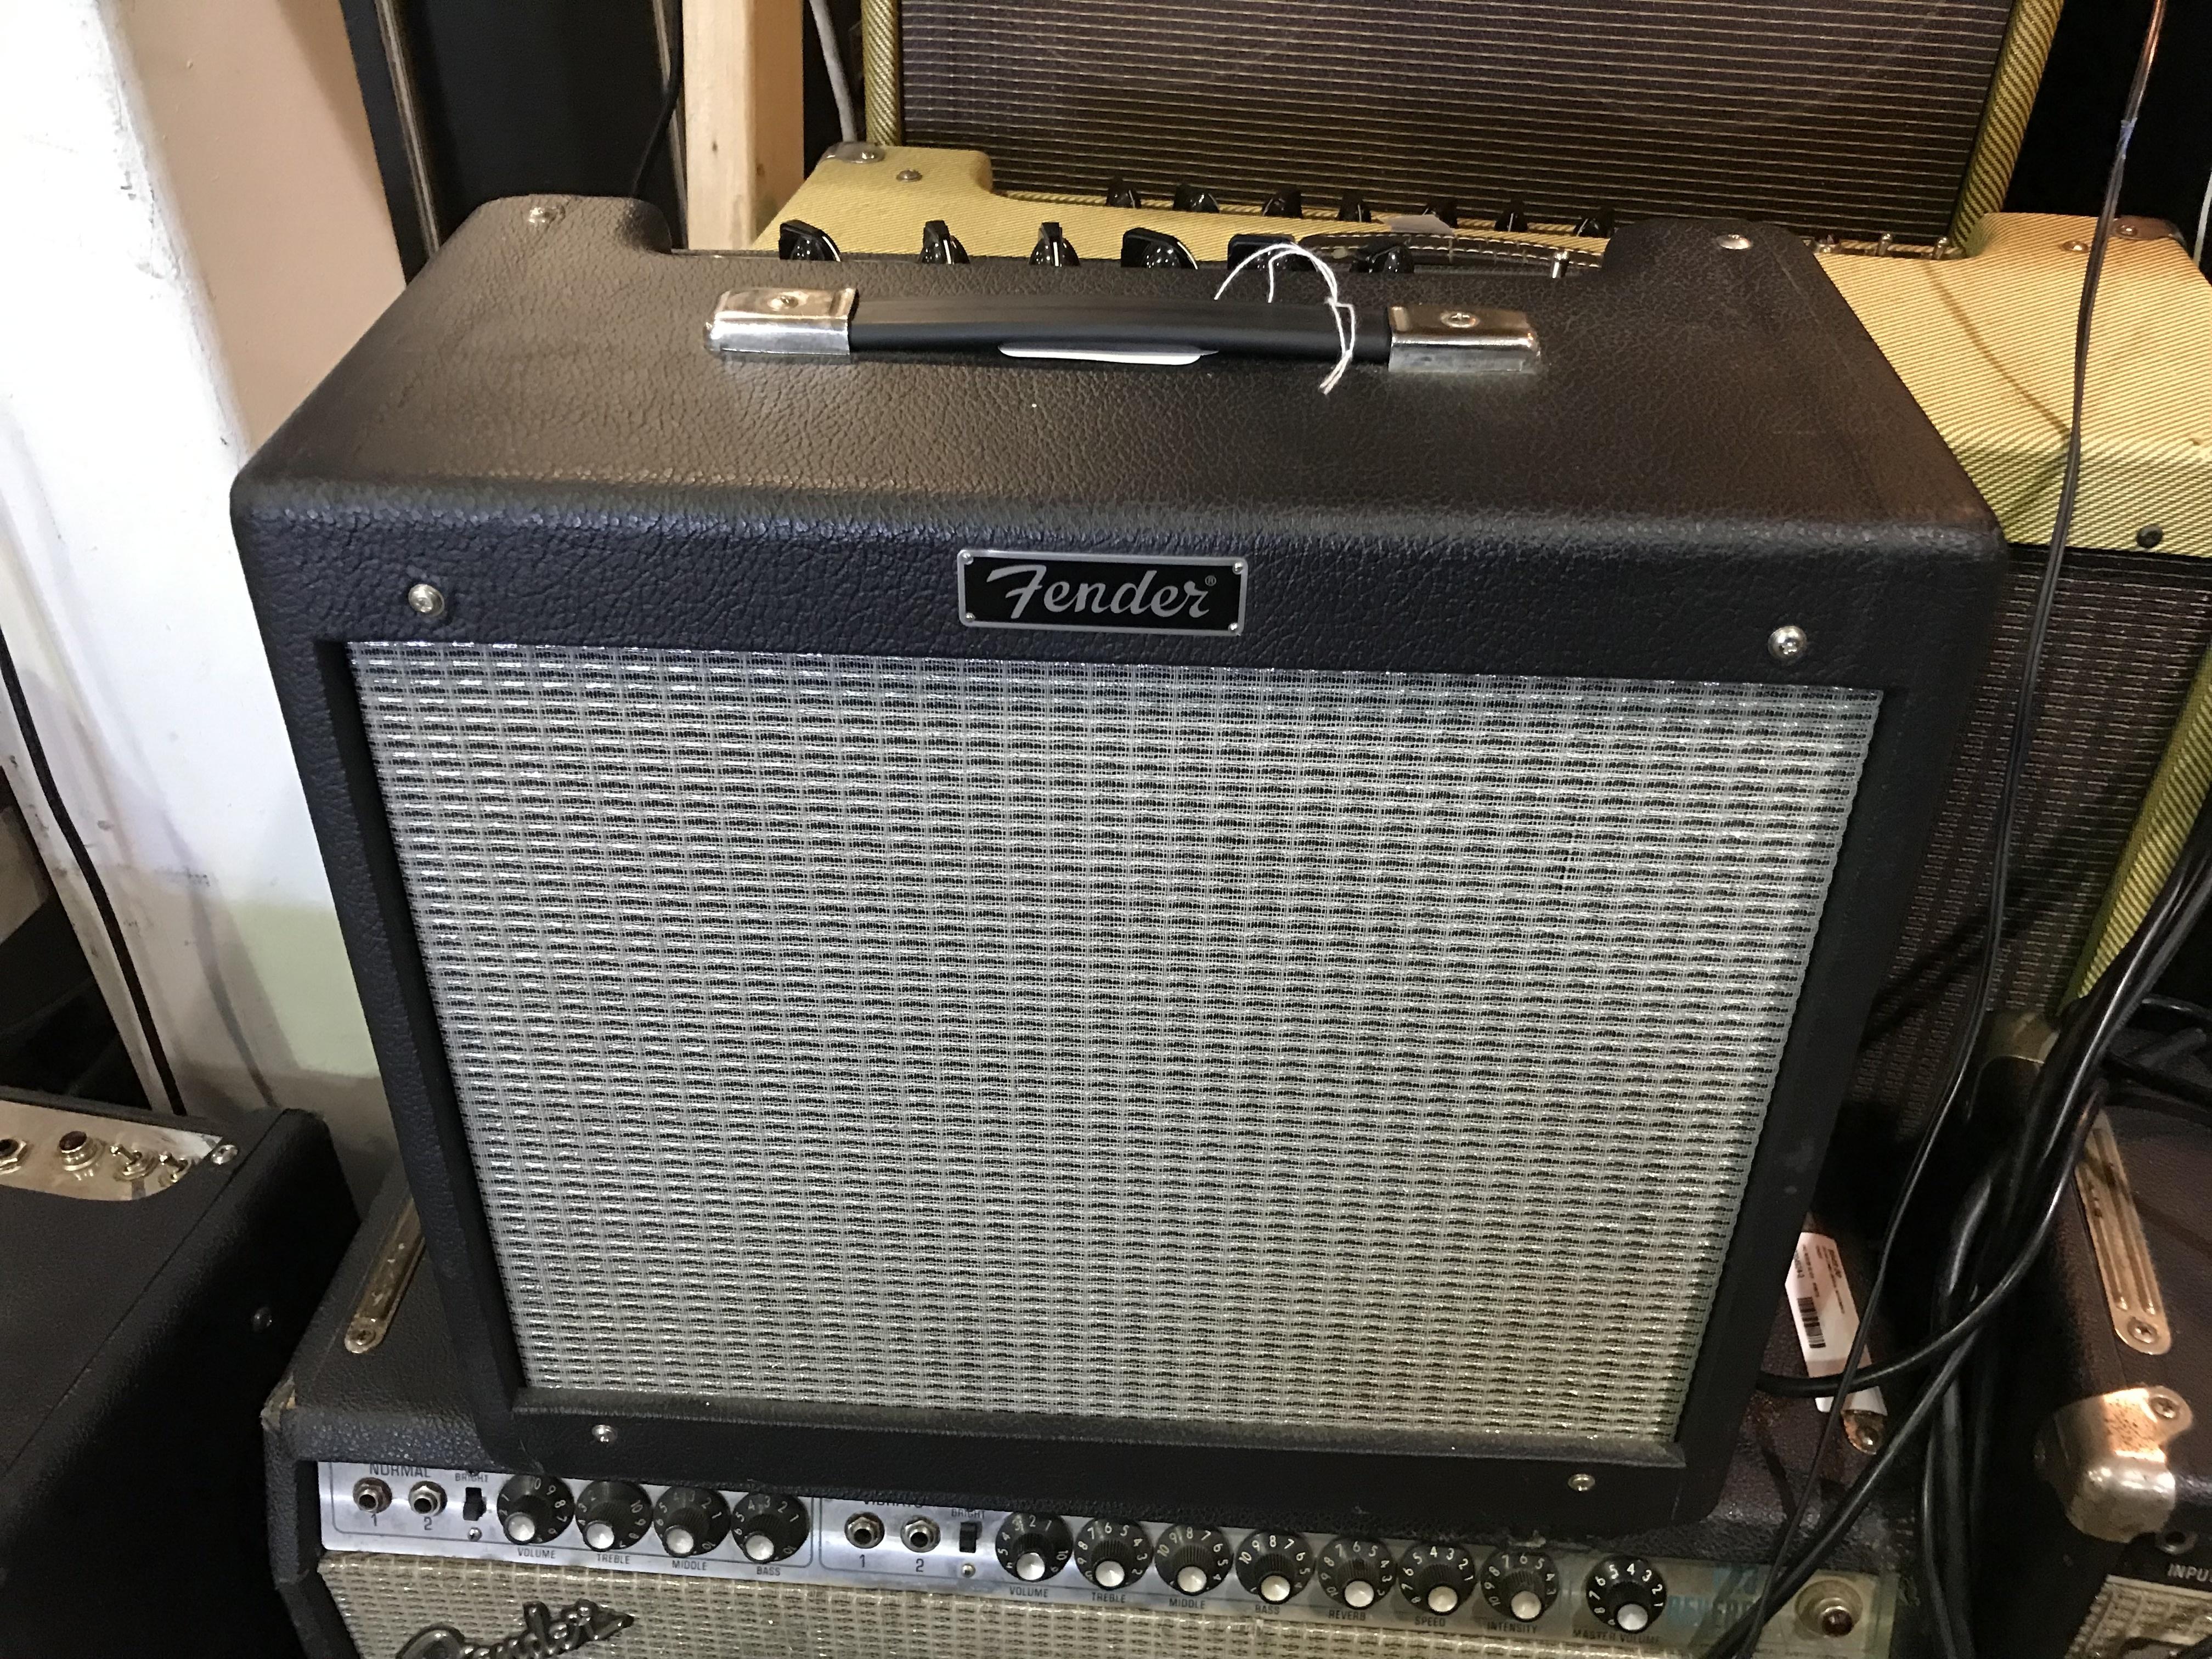 FENDER BLUES JR III 15W 1X12 Tube Guitar Combo Amp